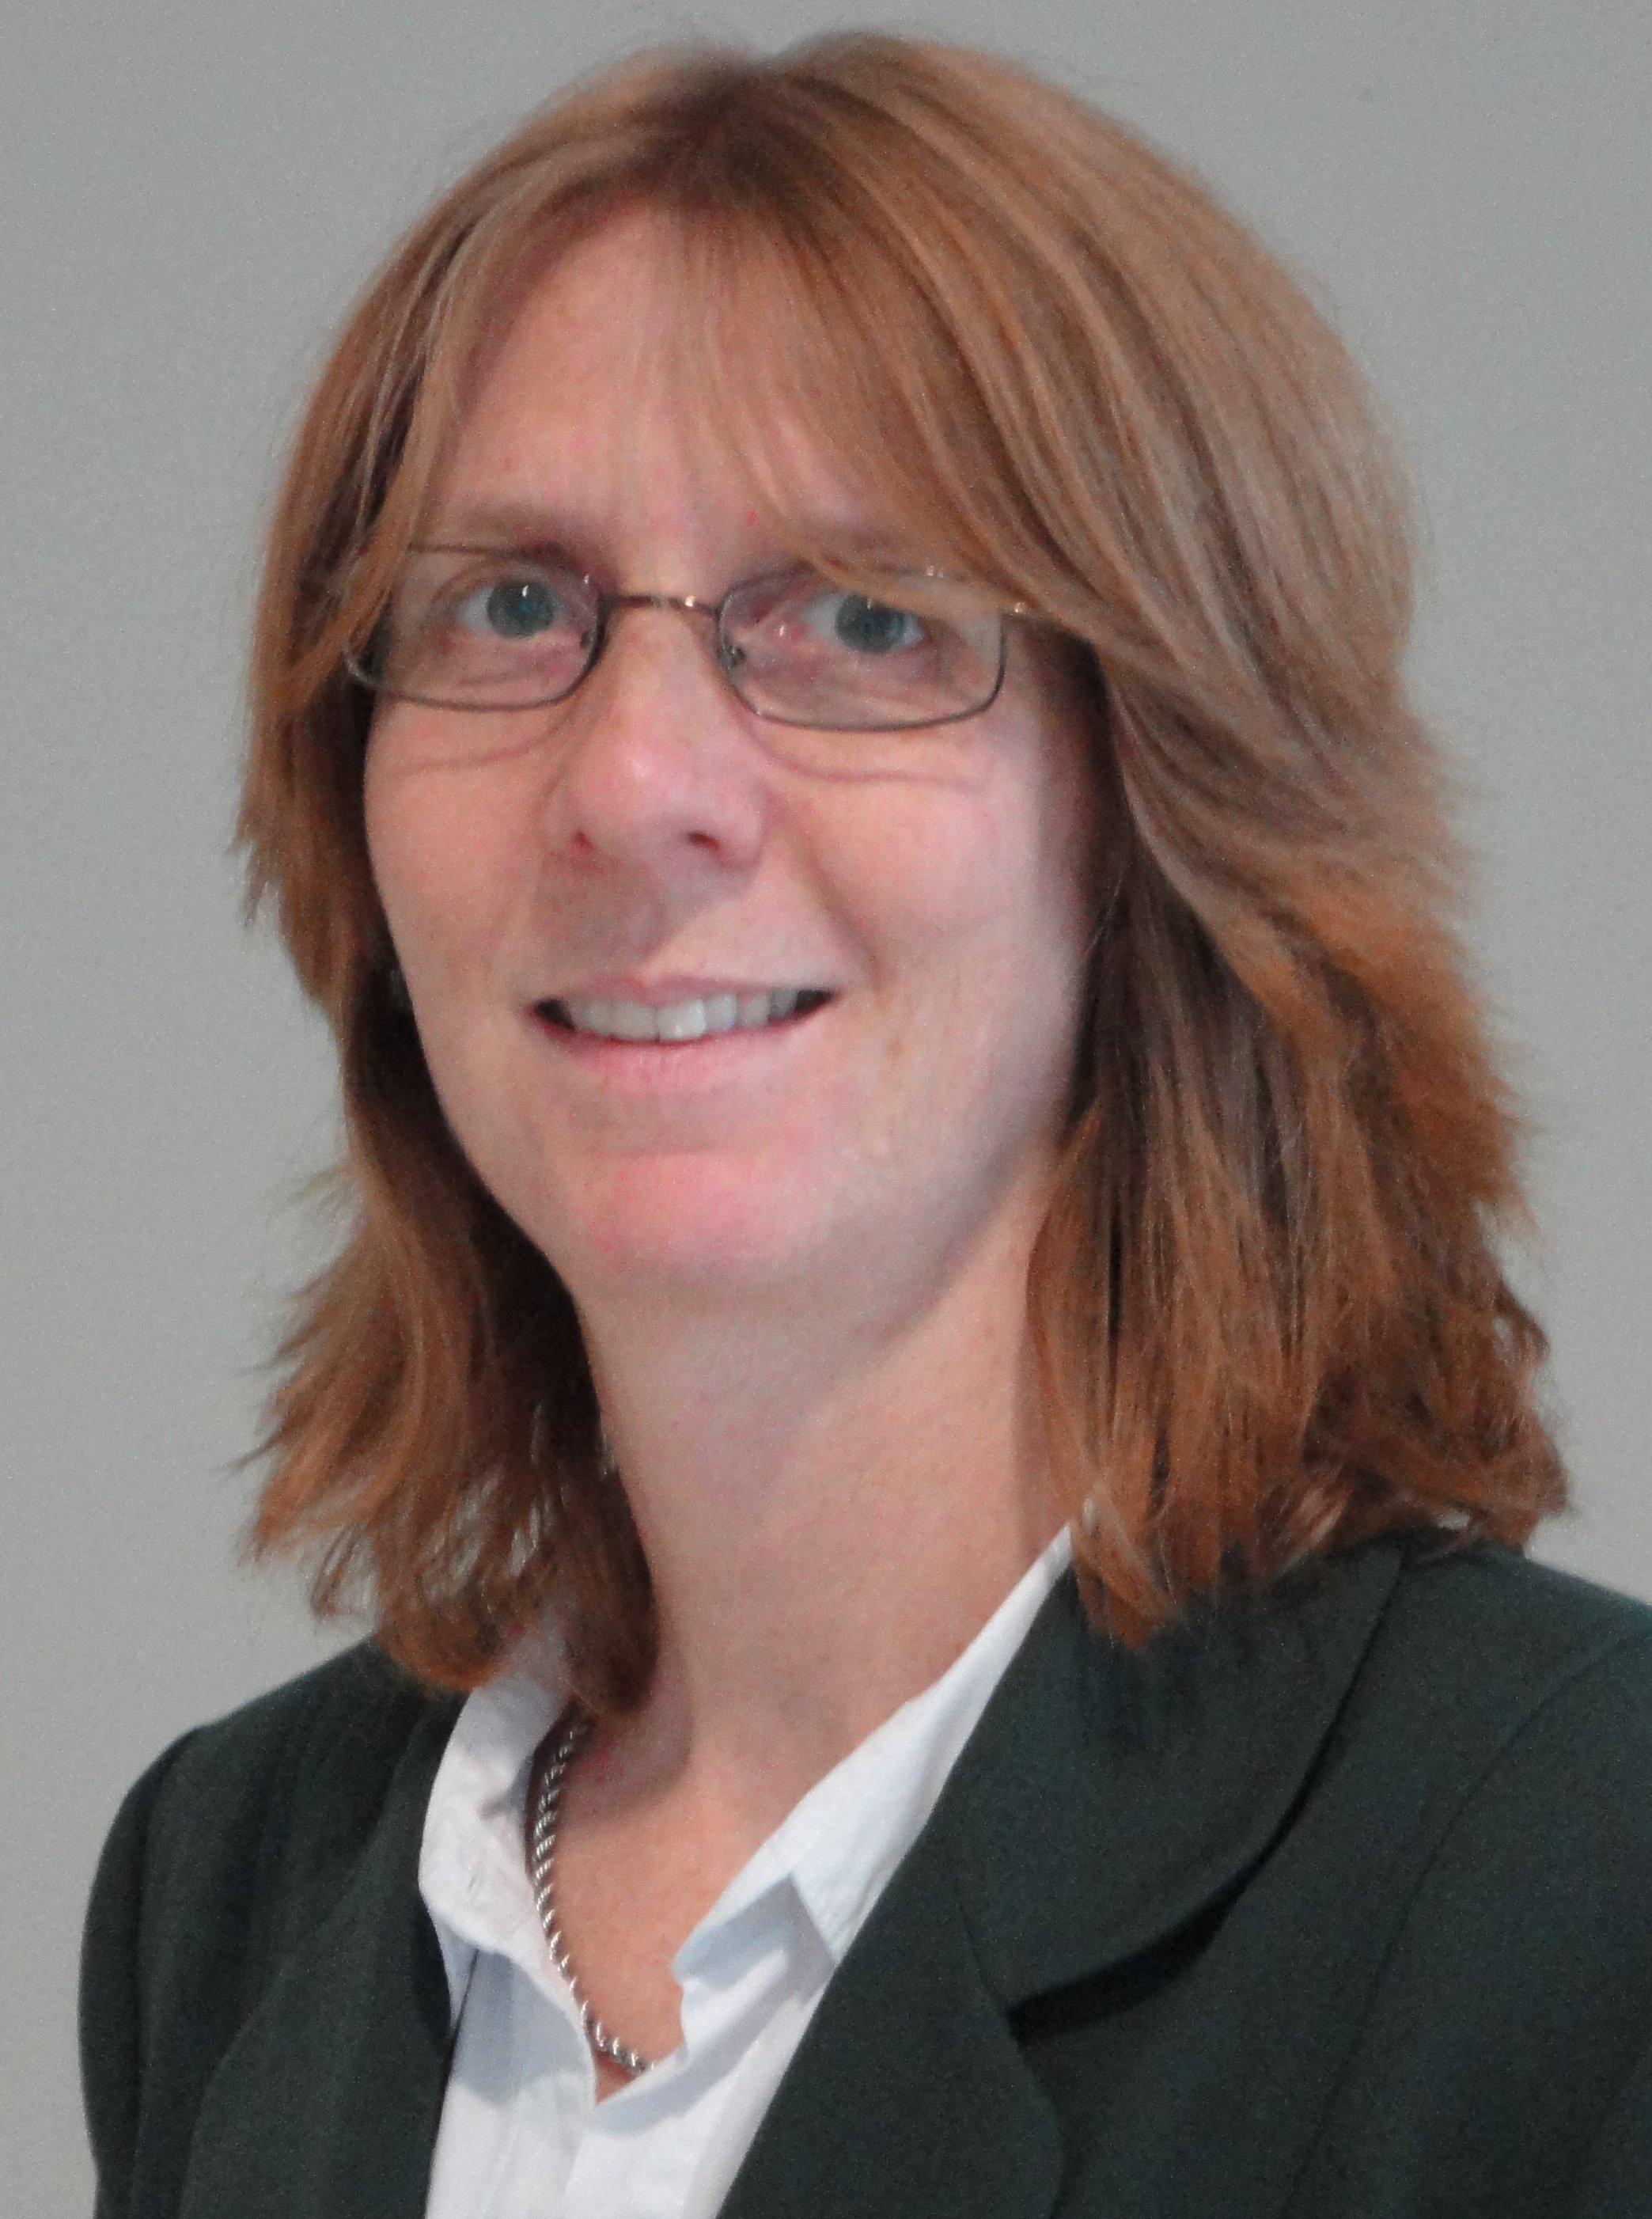 Patricia Dolez, PhD, PEng,    Assistant Professor, Textile Science, University of Alberta, Edmonton, Canada